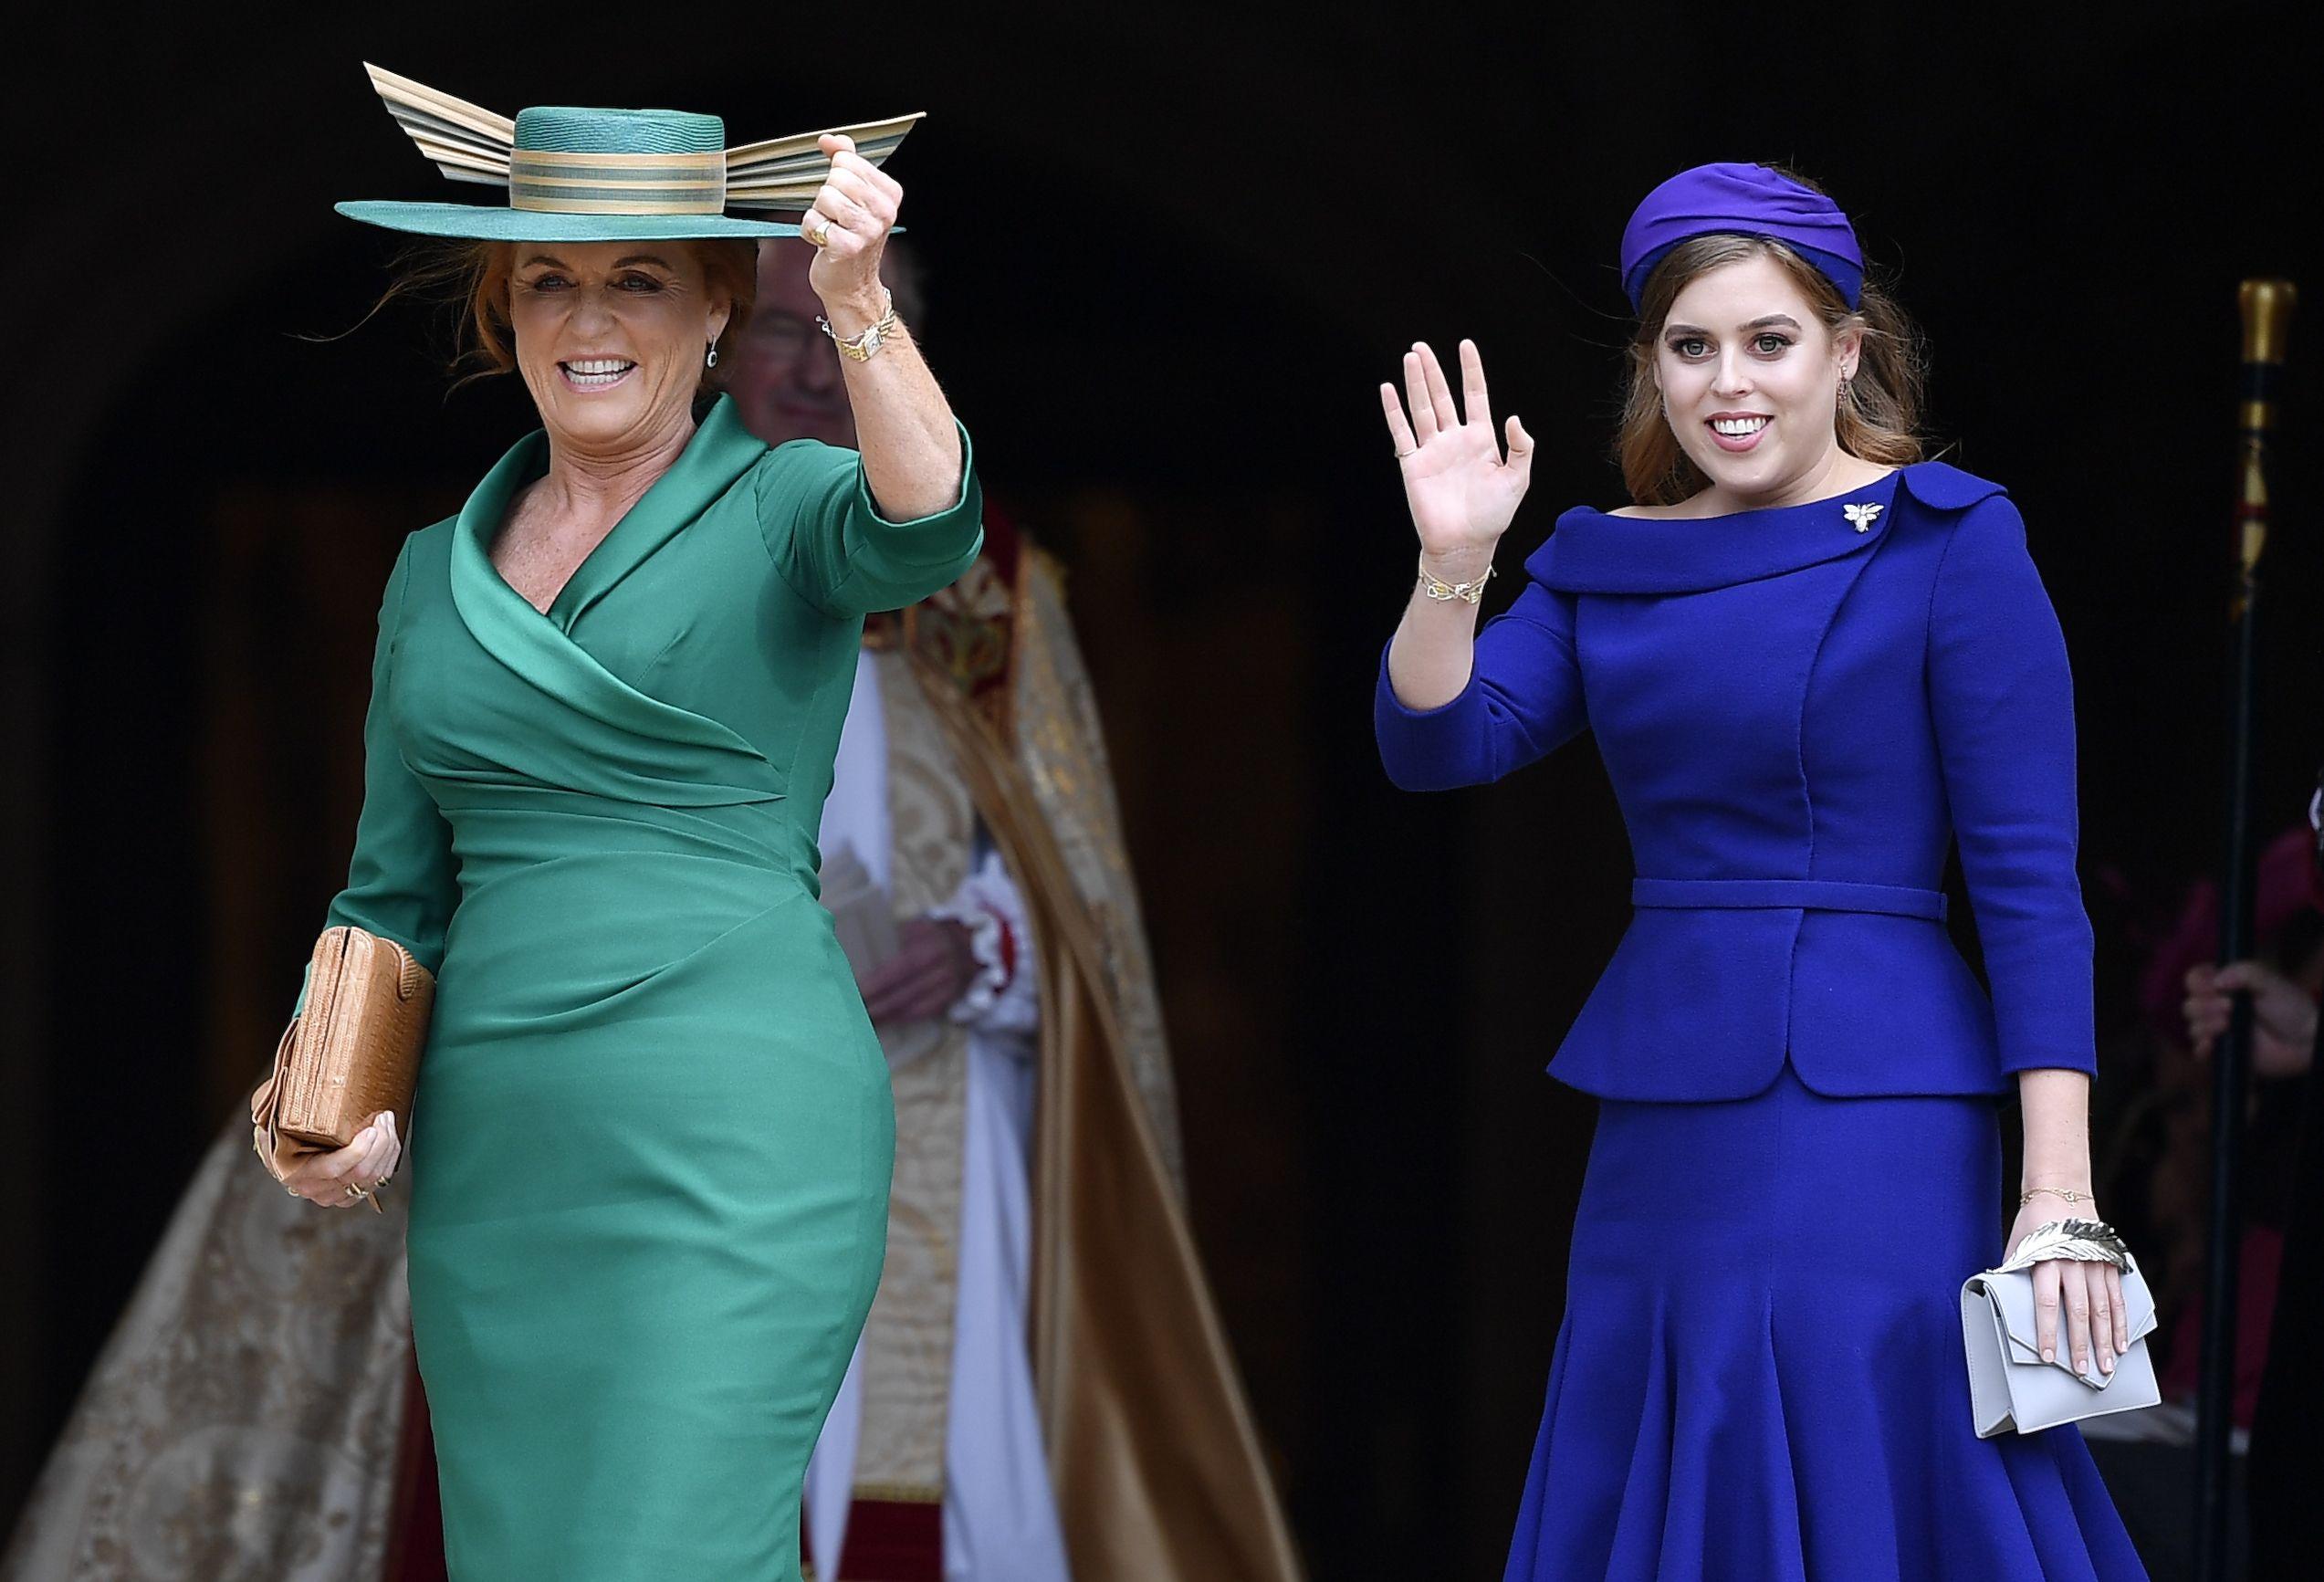 30+ Best Royal Wedding Hats - British Royal Wedding Hats Through the Years 42fc695ab10